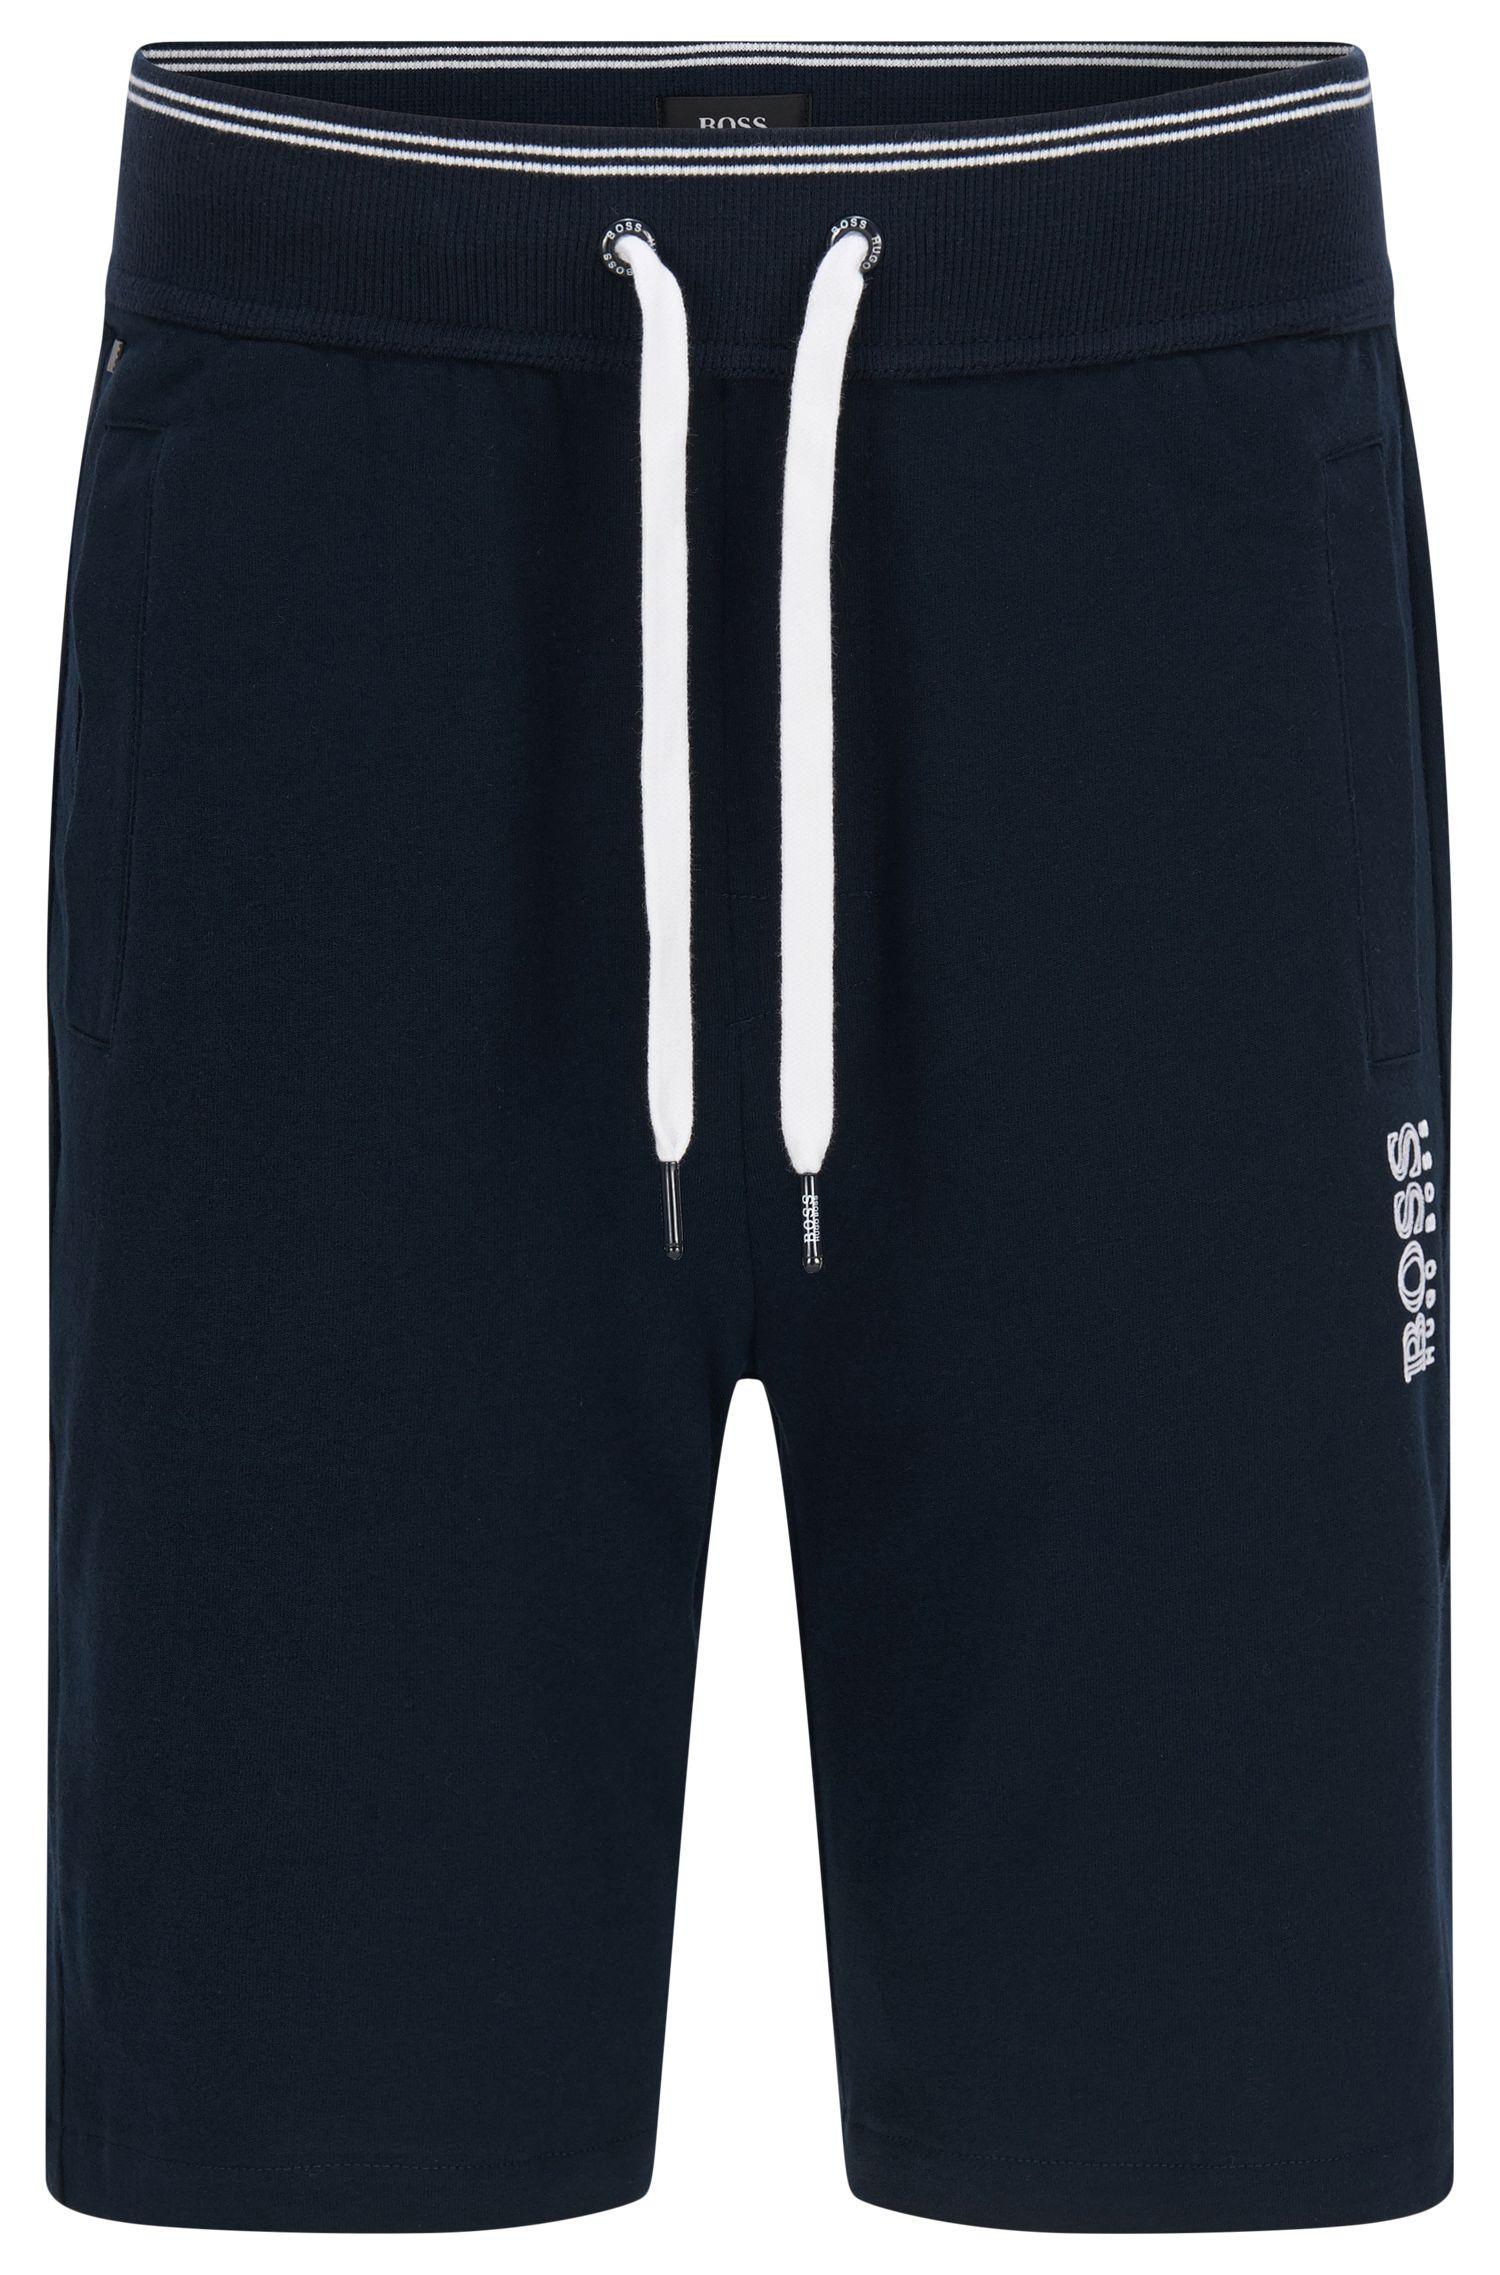 Pantalón corto de chándal en algodón: 'Short Pant'